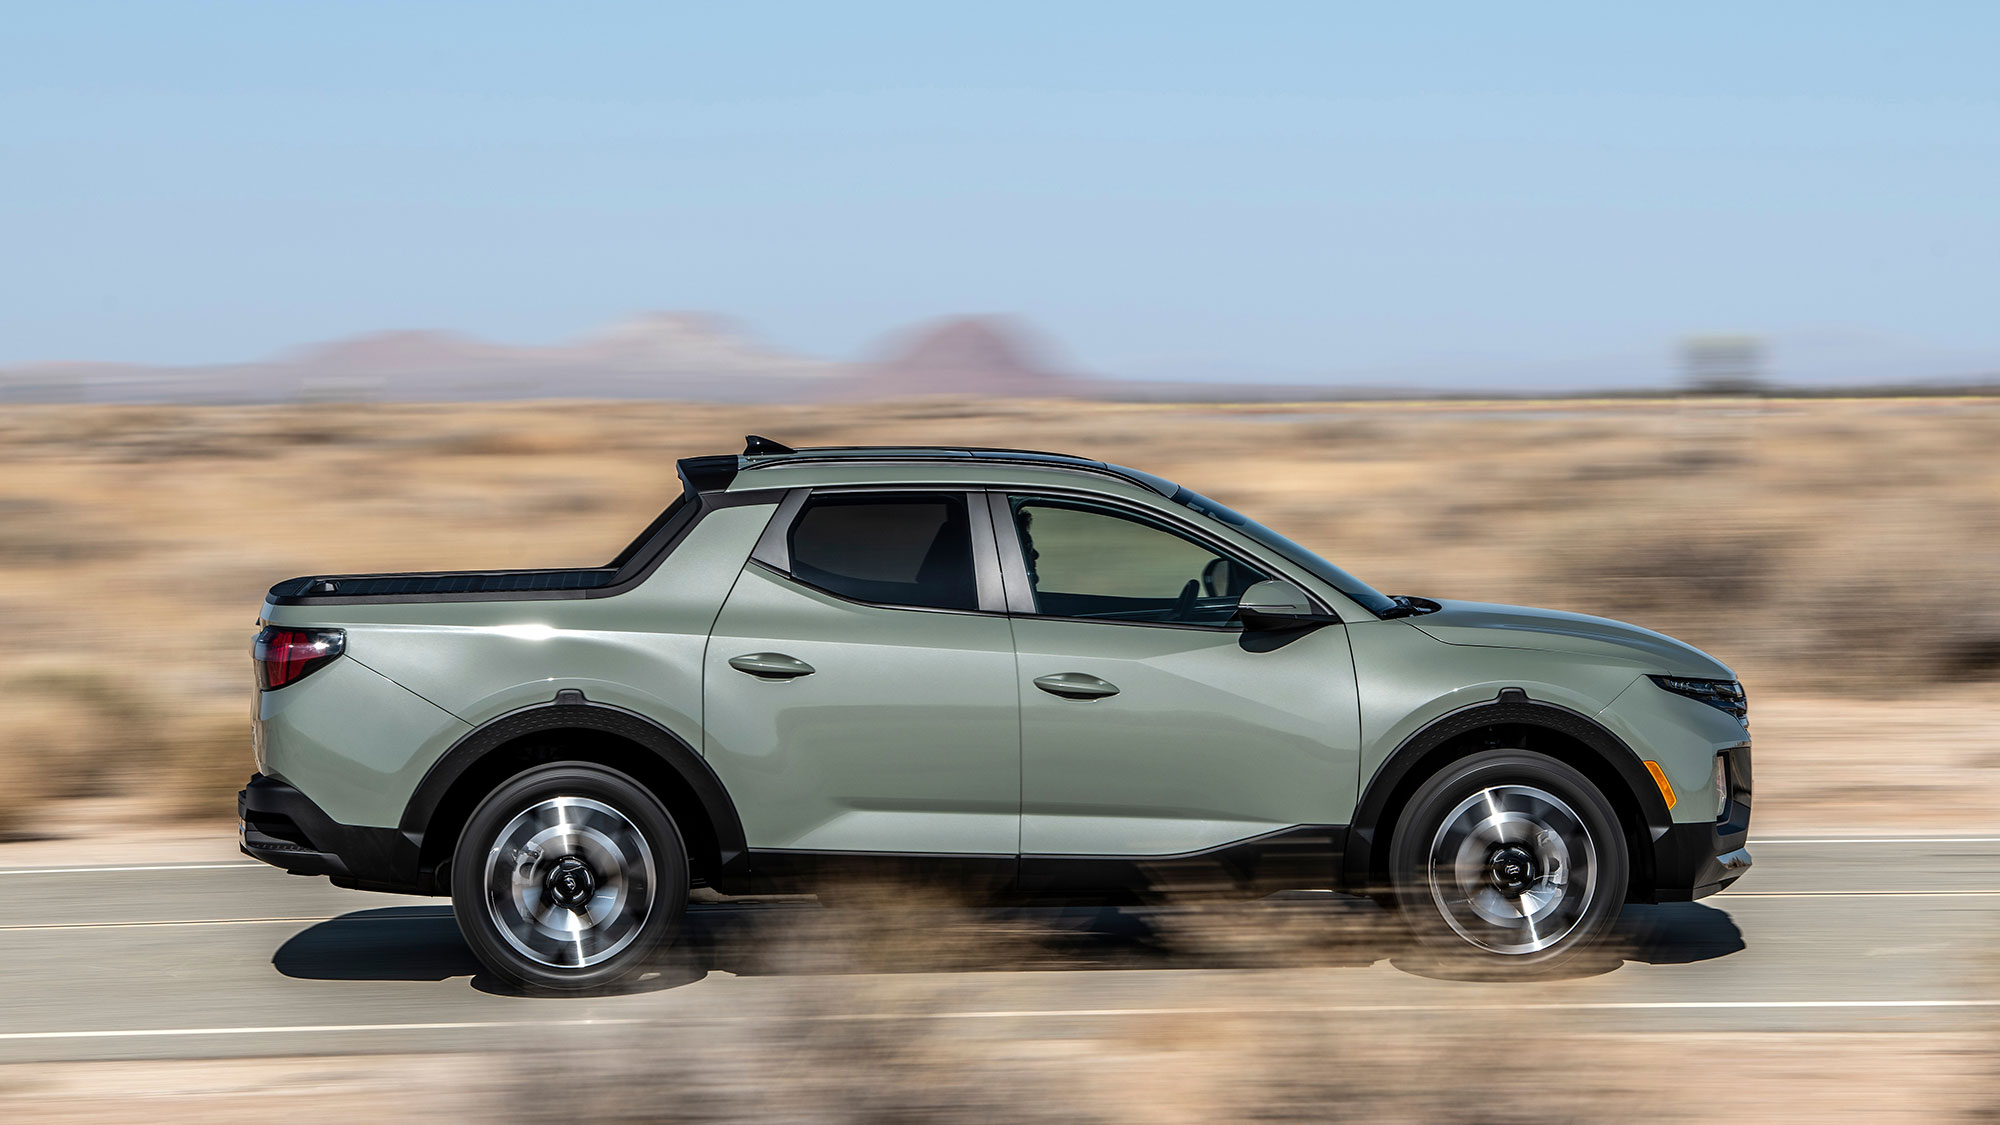 2022 Hyundai Santa Cruz Pickup Truck